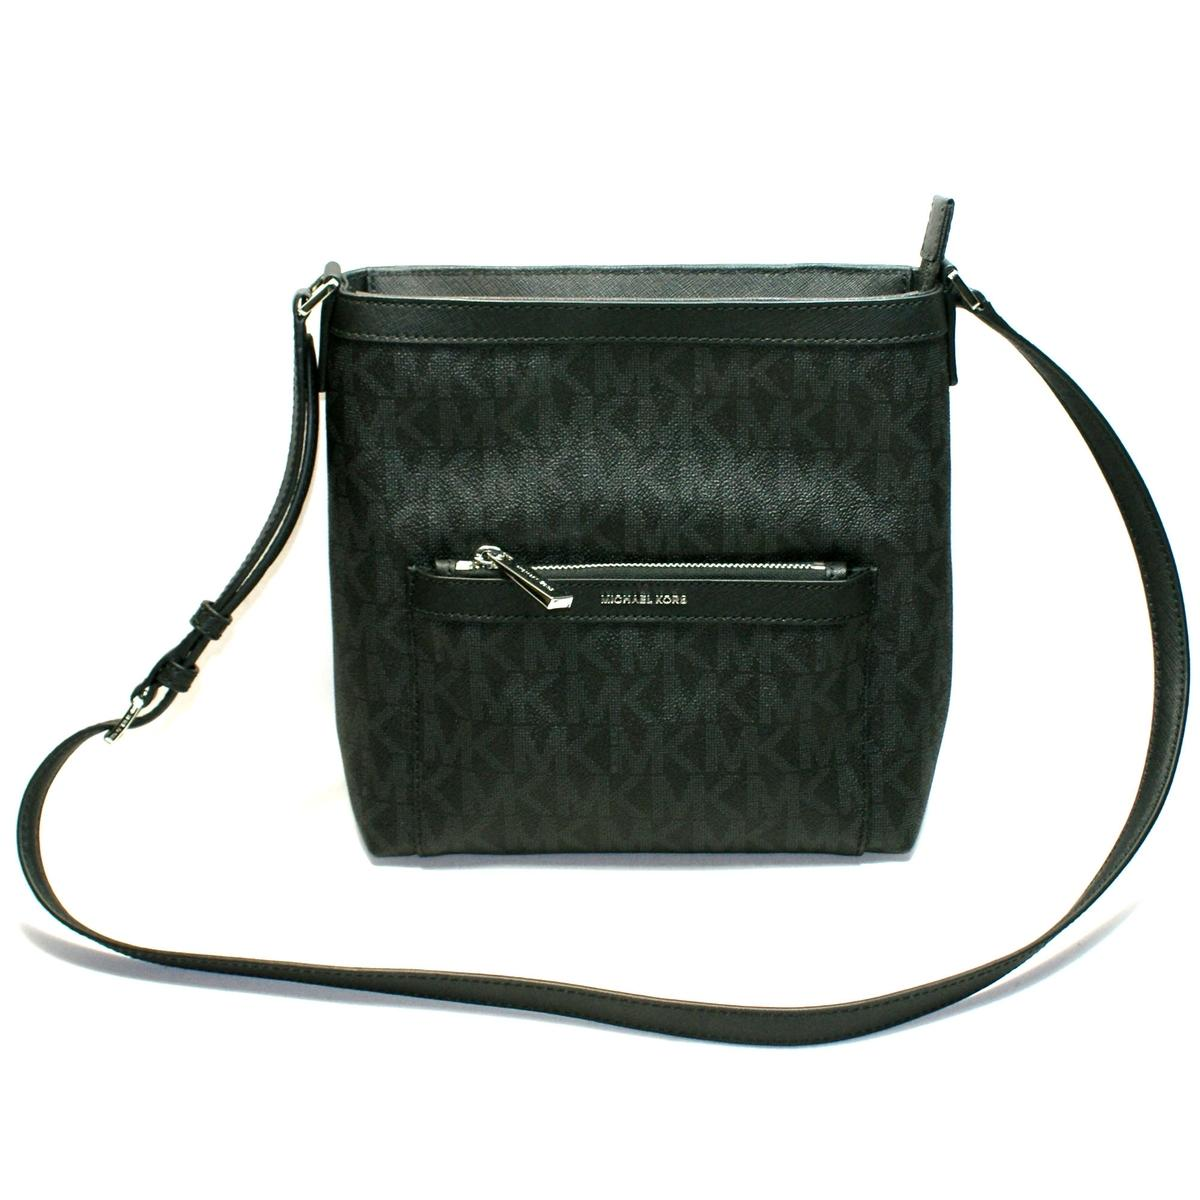 48247c2b0d78 Home · Michael Kors · Morgan Medium Messenger/ Crossbody Bag Black. CLICK  THUMBNAIL TO ZOOM. Found ...